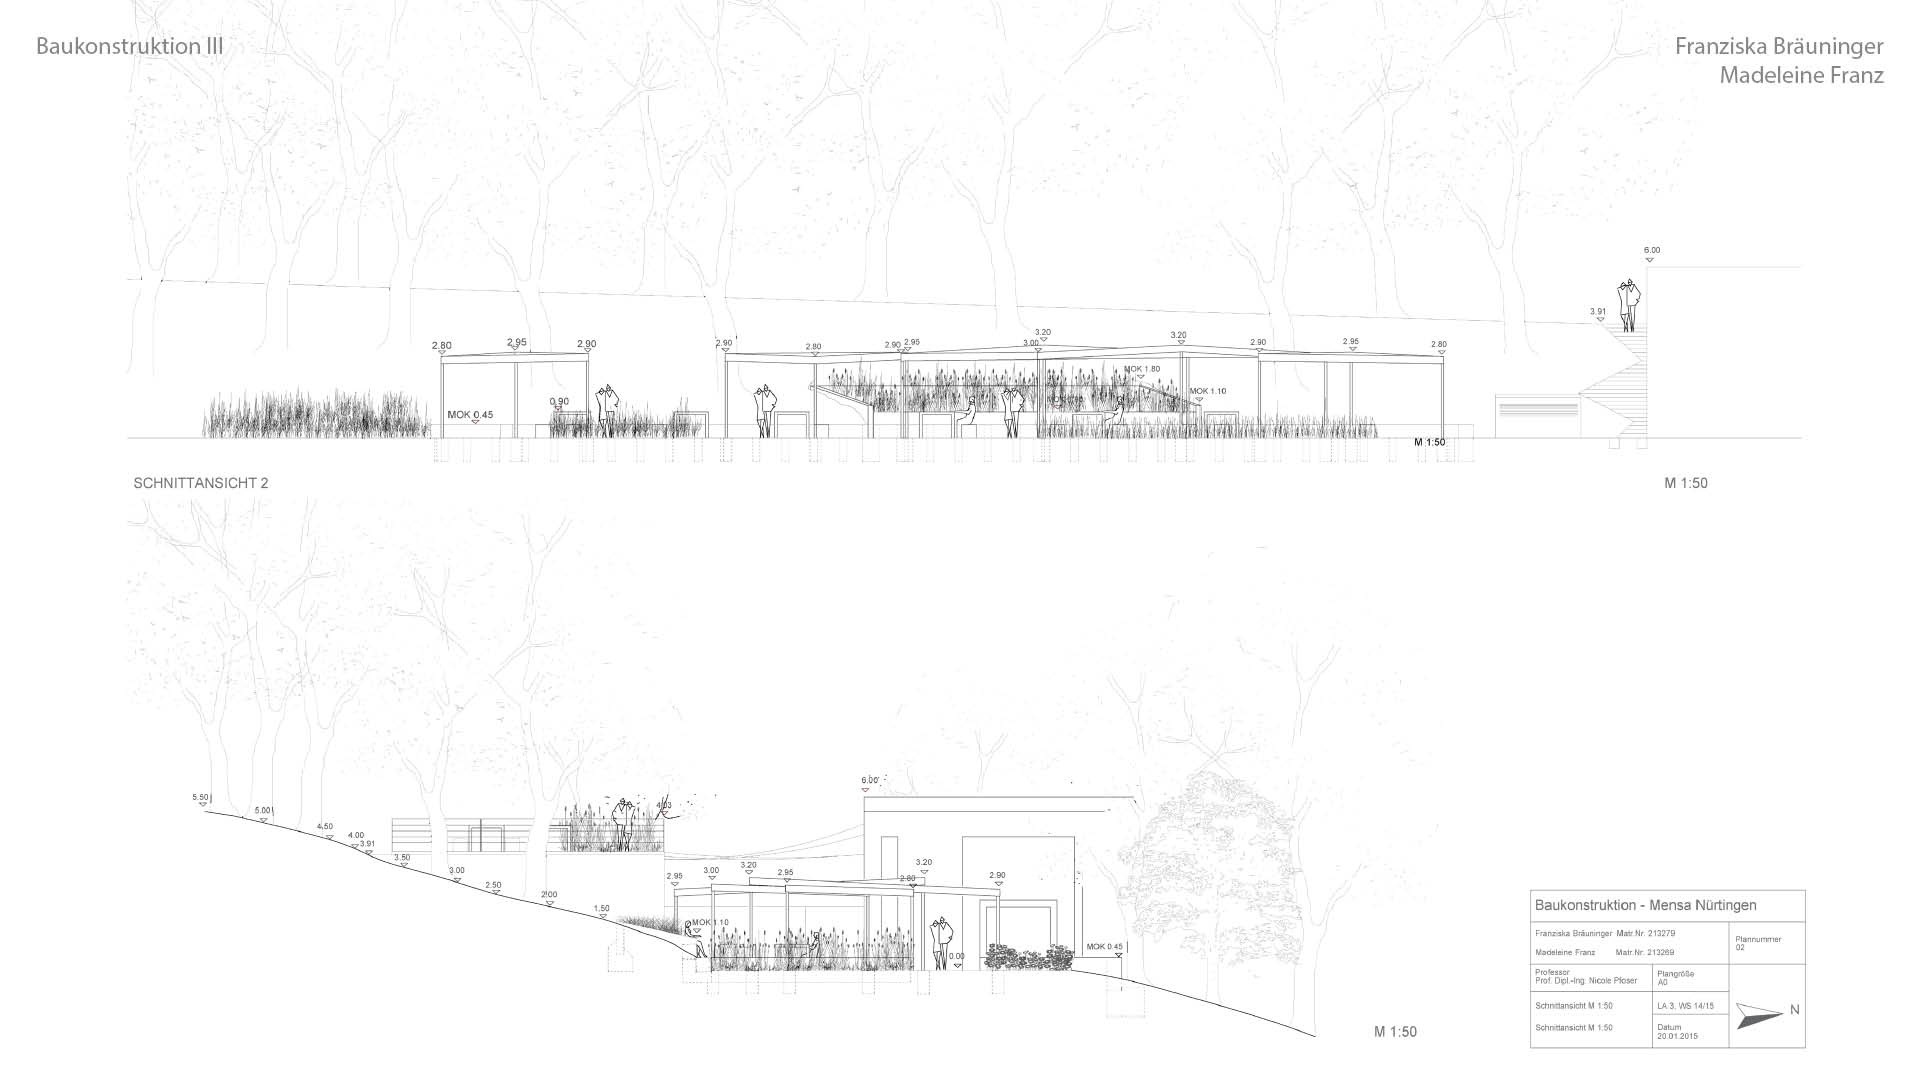 02 14 03 Baukonstruktion III